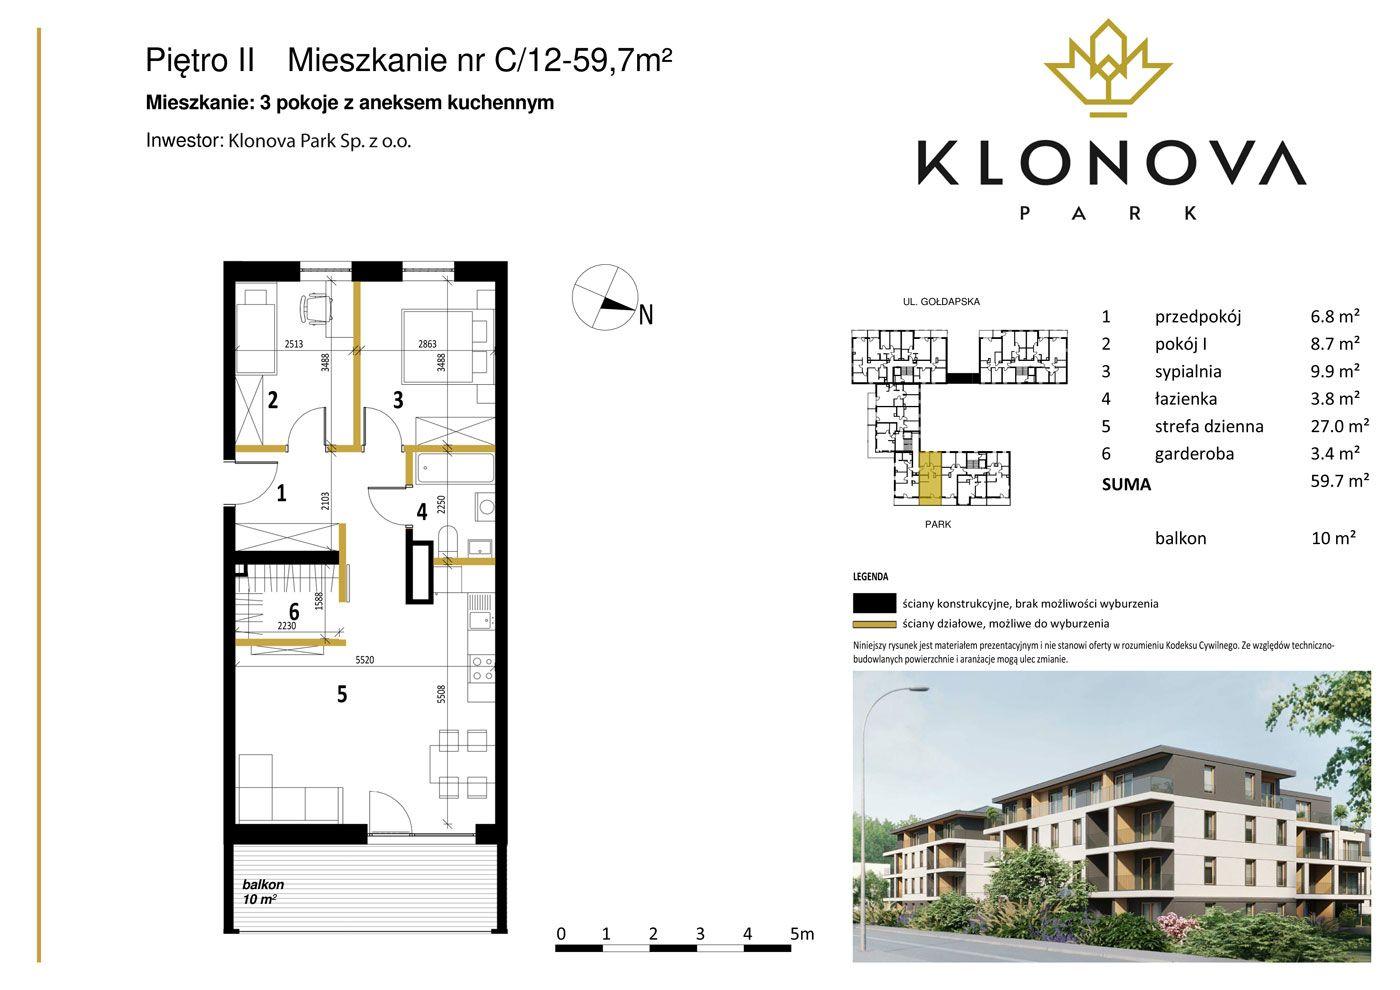 Apartamenty Klonova Park - Plan mieszkania C/12